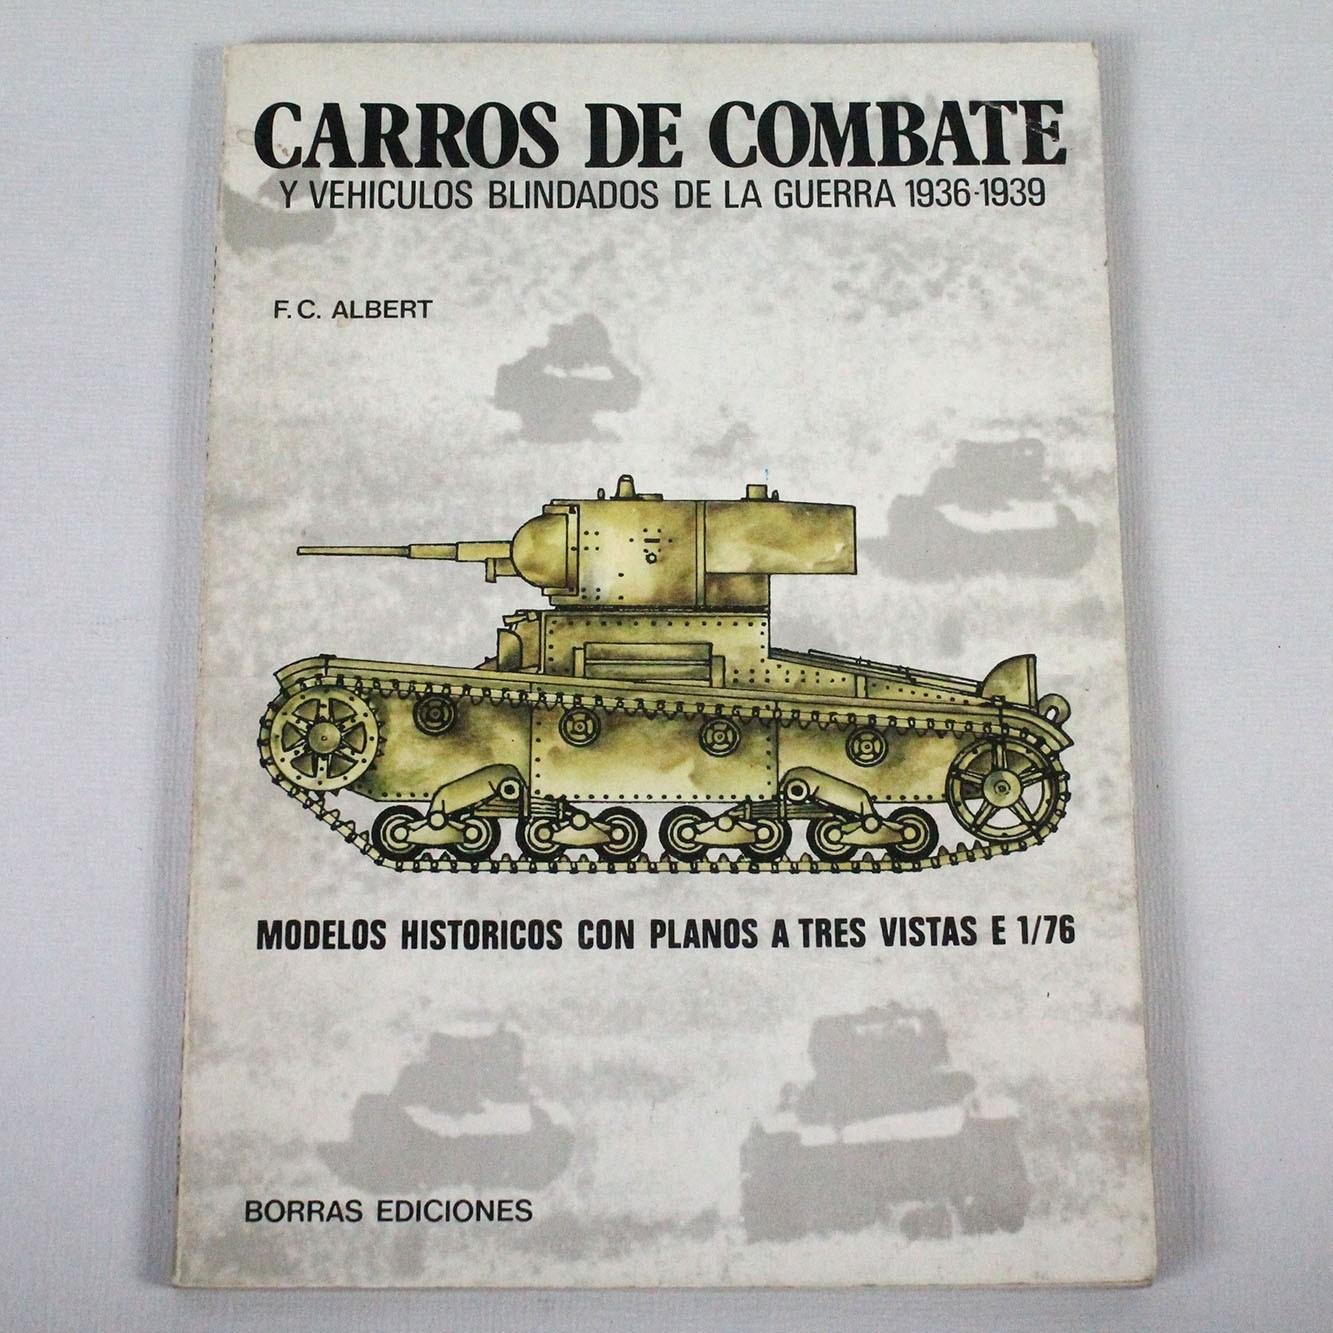 LIBE-CARROS DE COMBATE